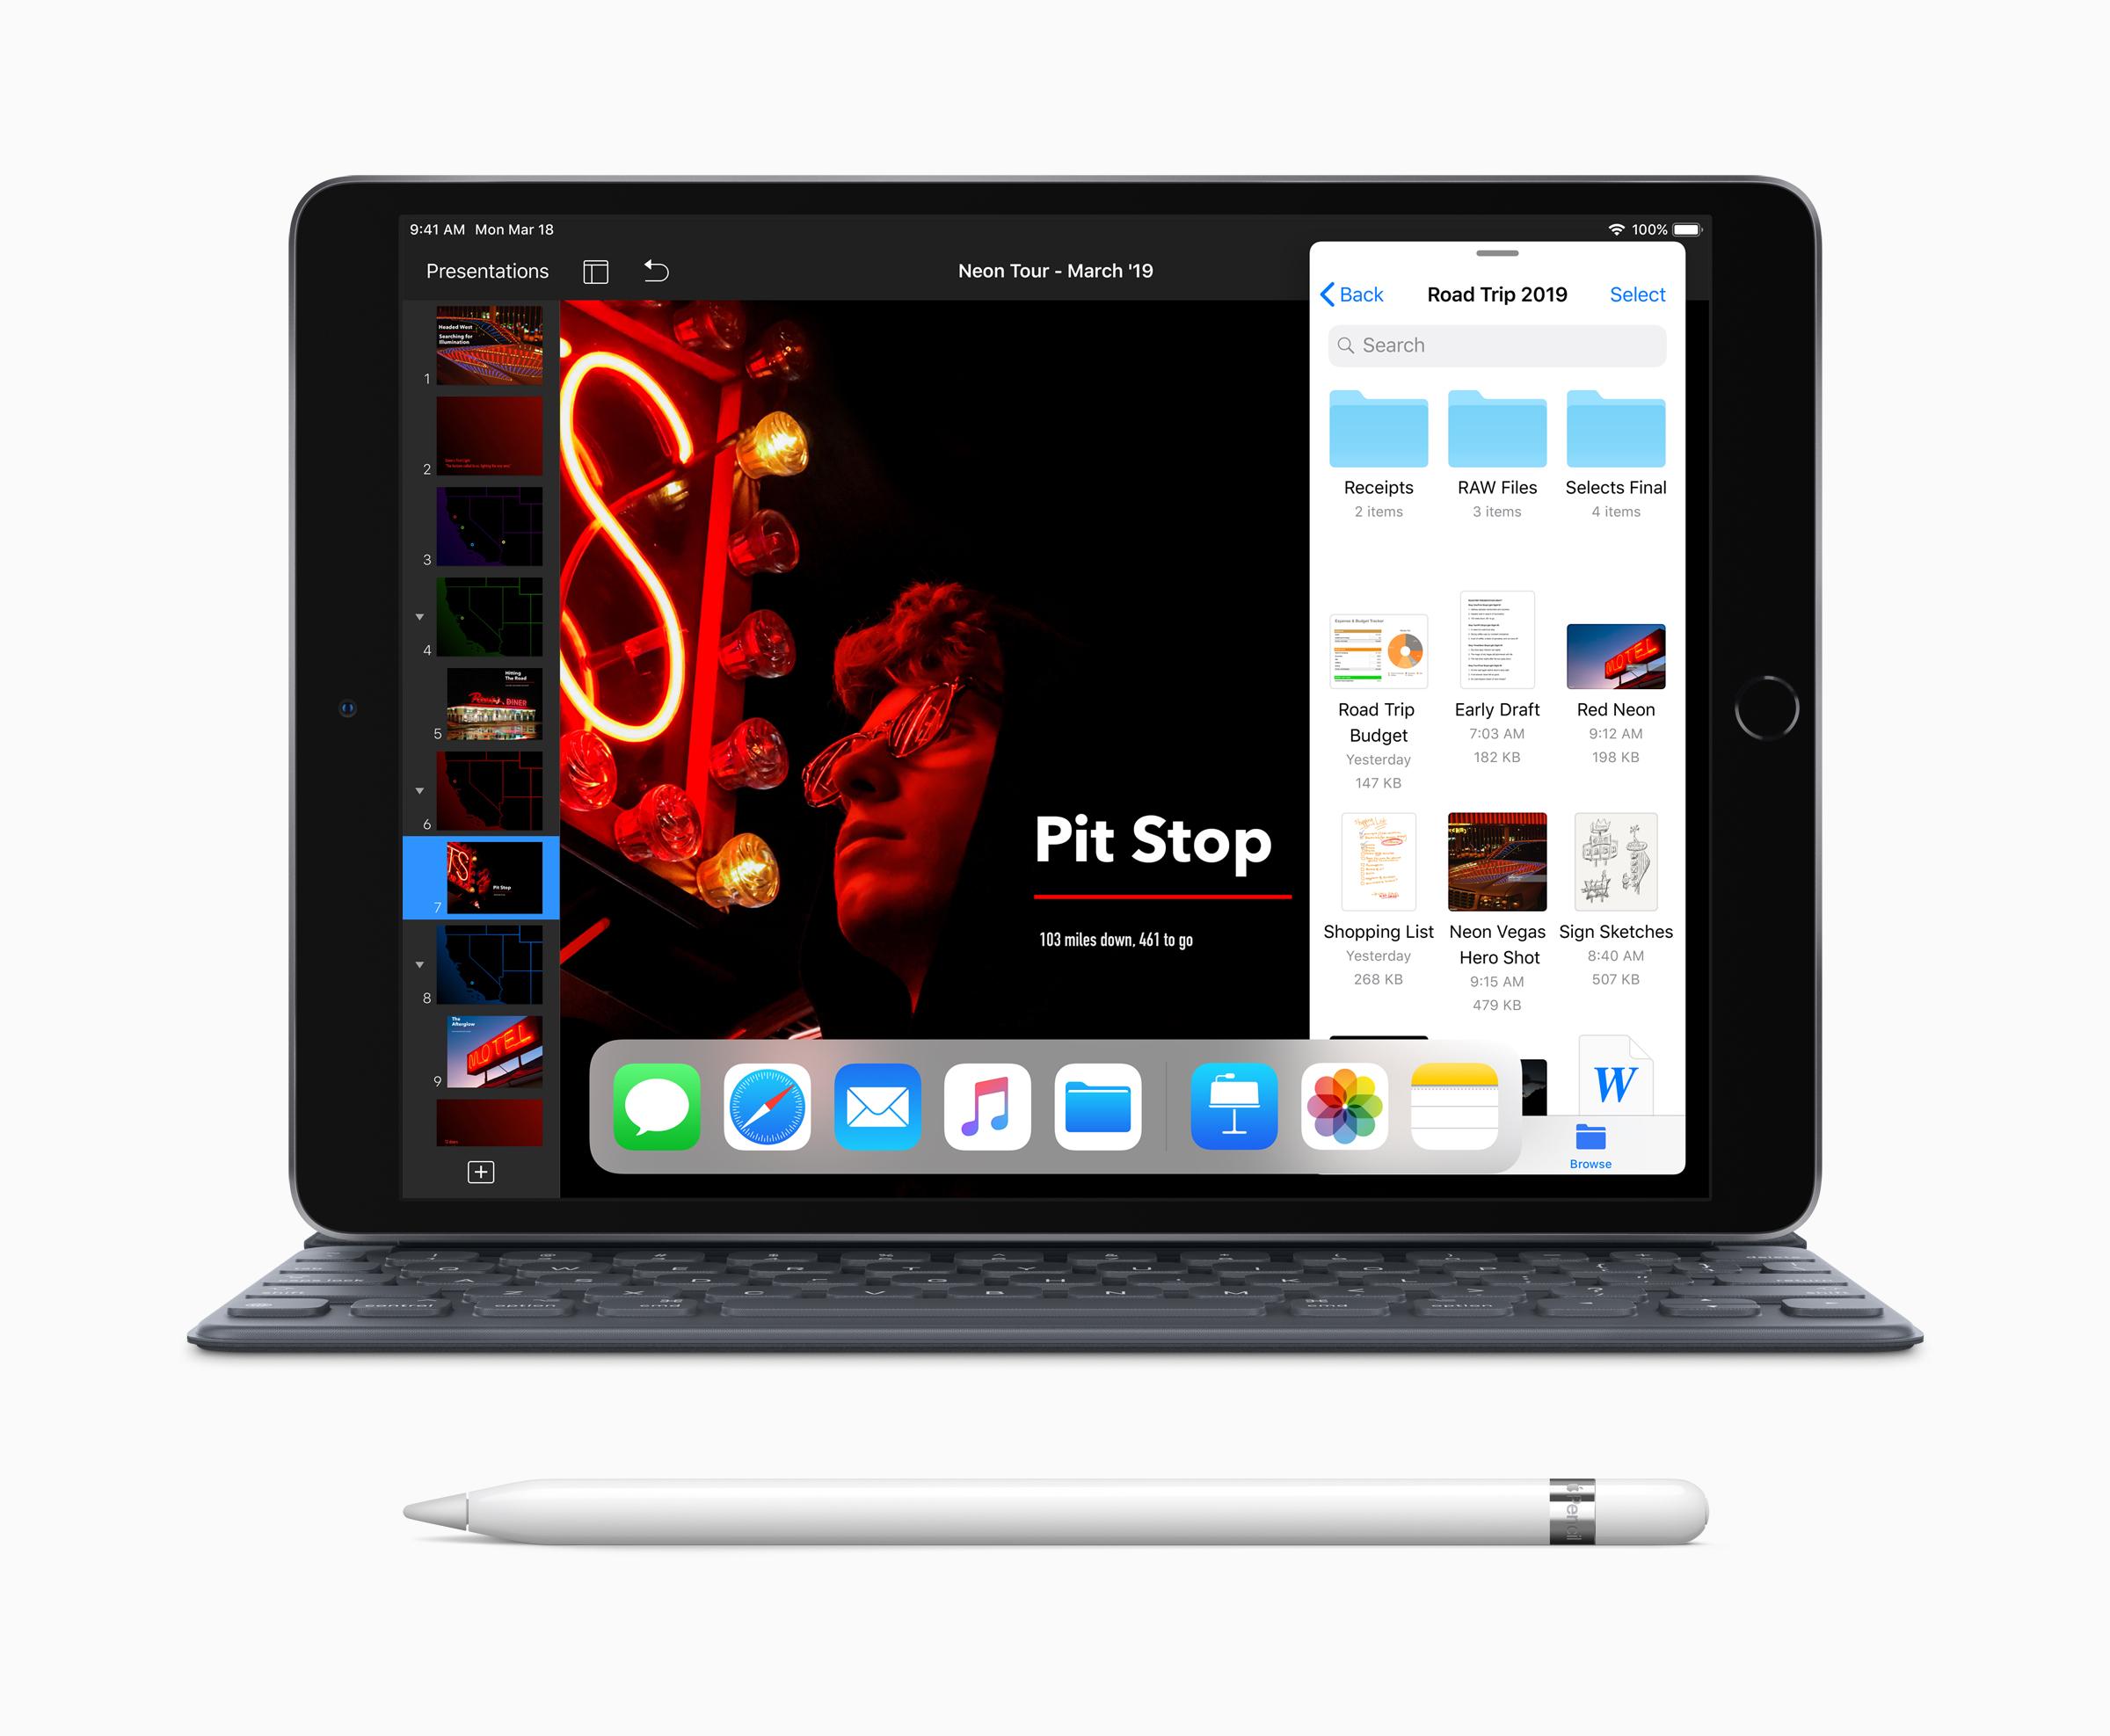 New-iPad-Air-with-Smart-Keyboard-Apple-Pencil-03192019.jpg